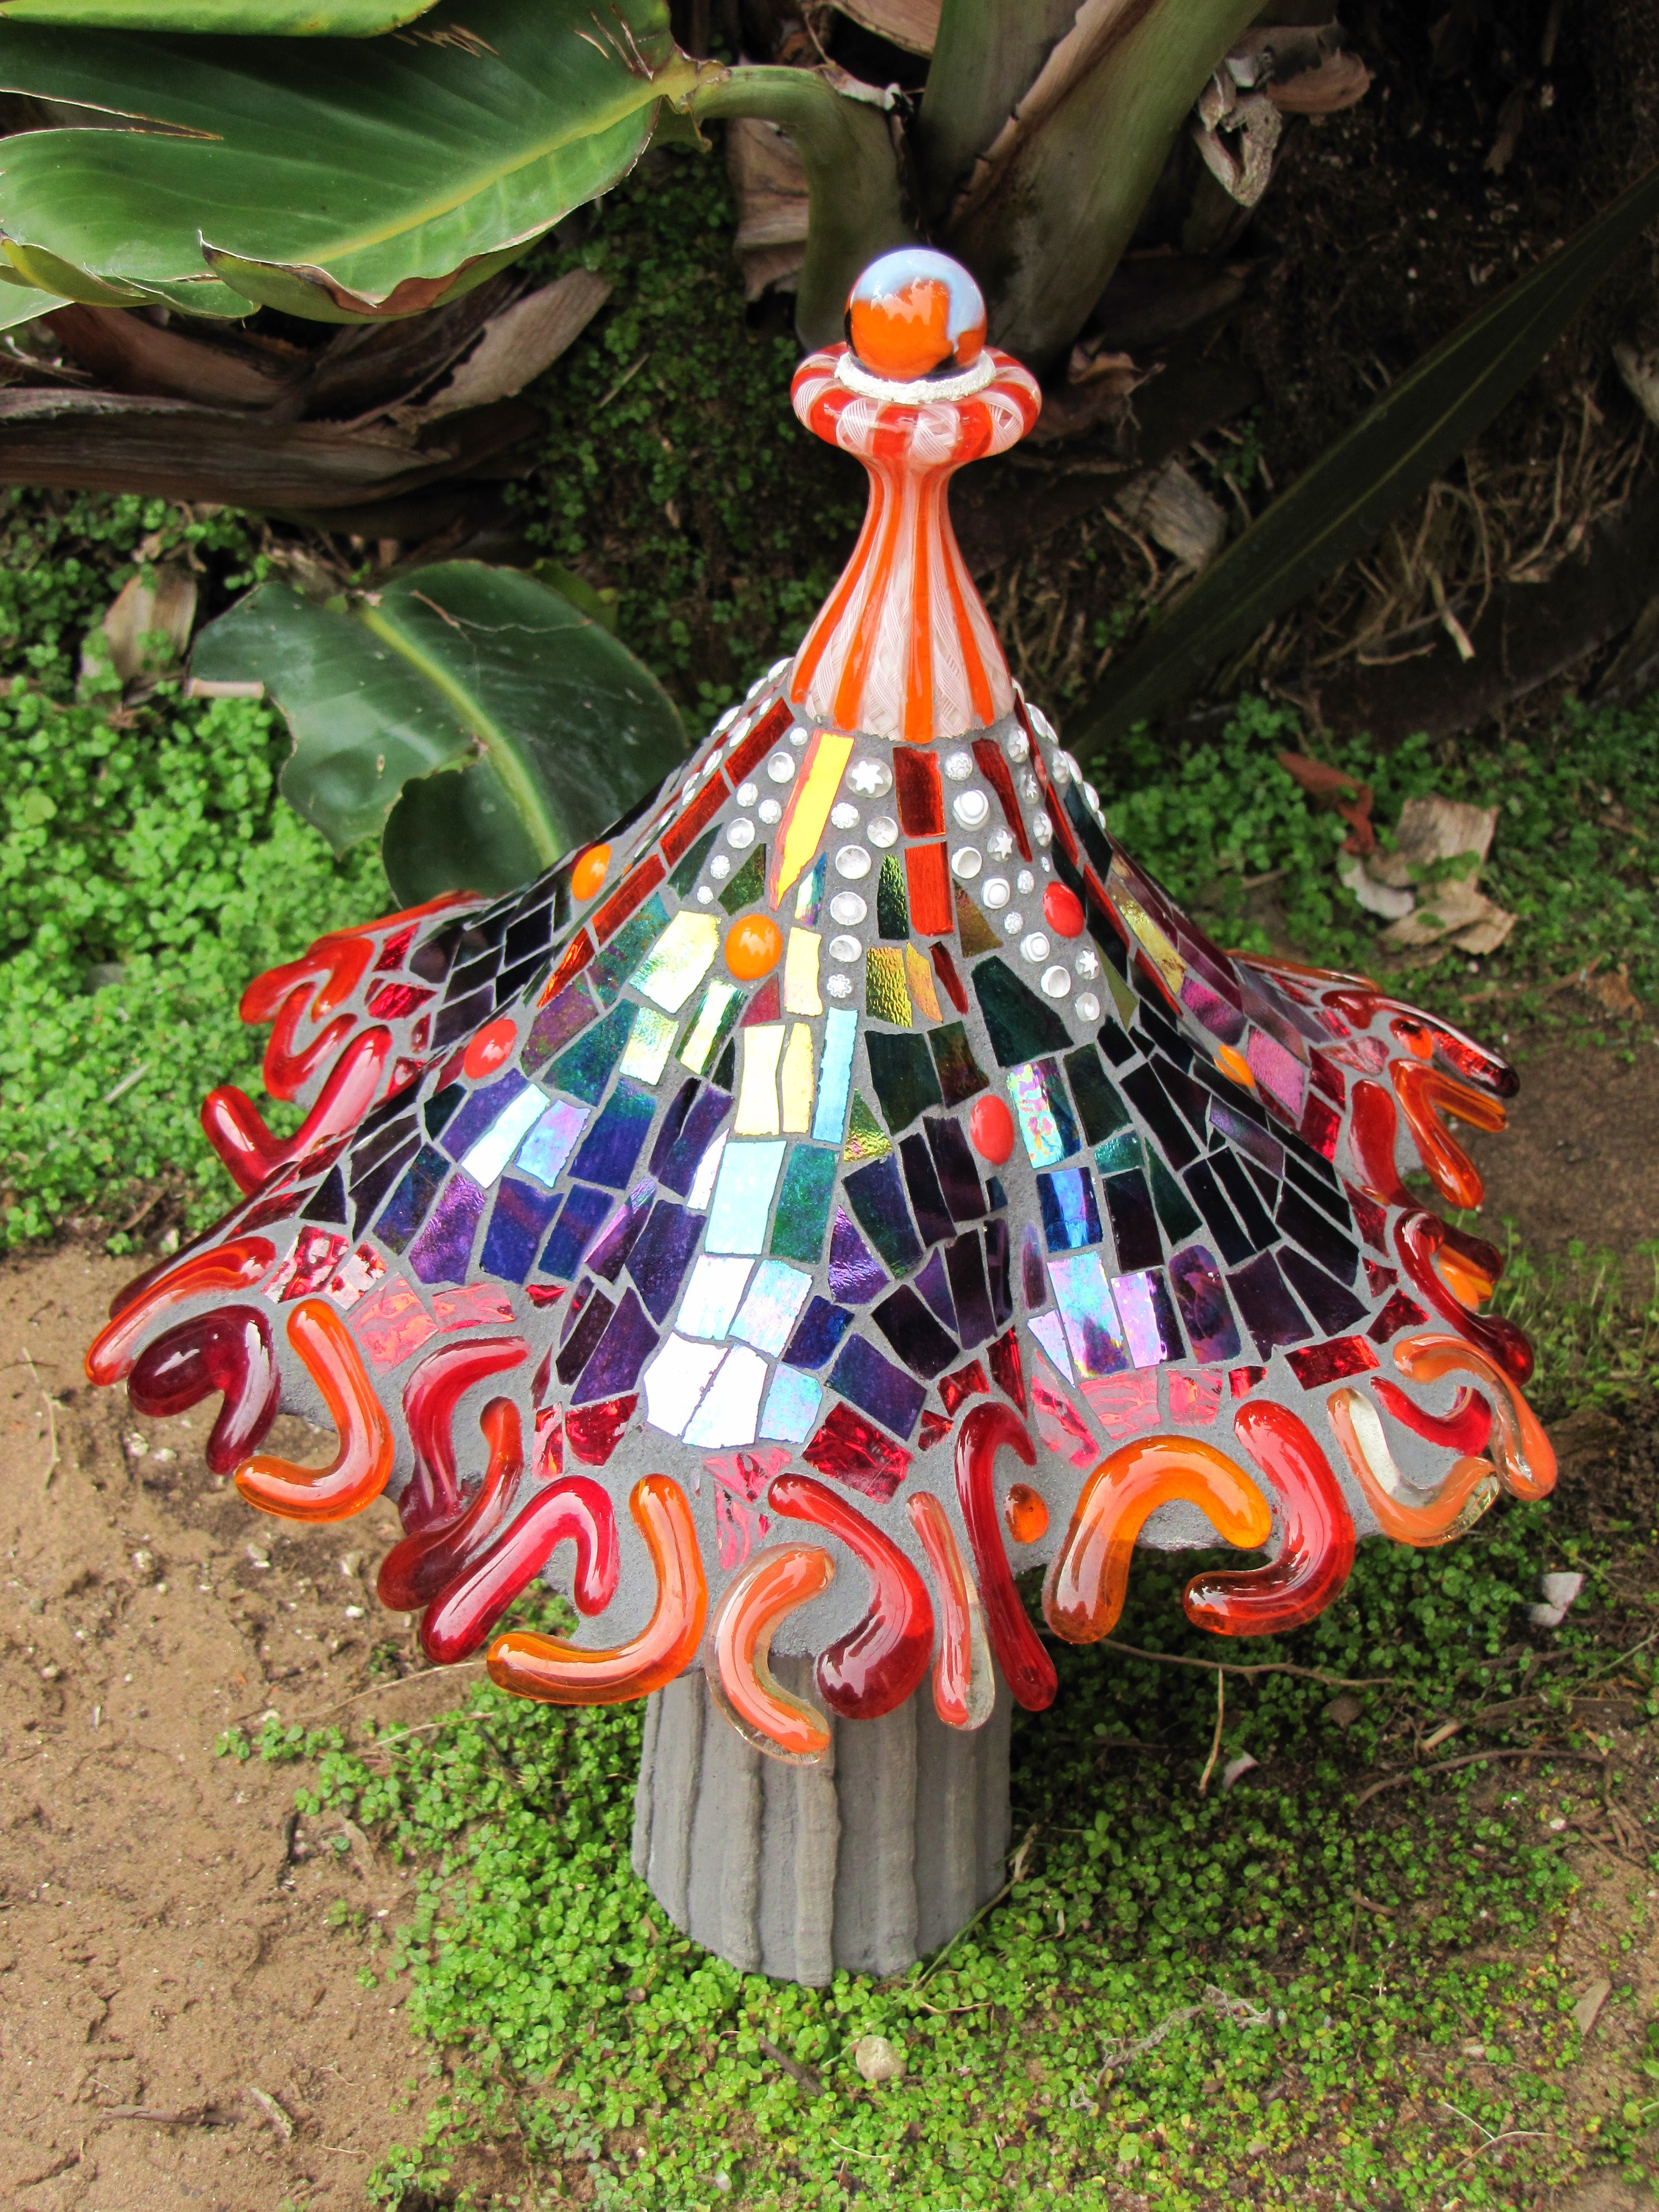 Orange Fringe Garden Mushroom. Mosaic Garden Art